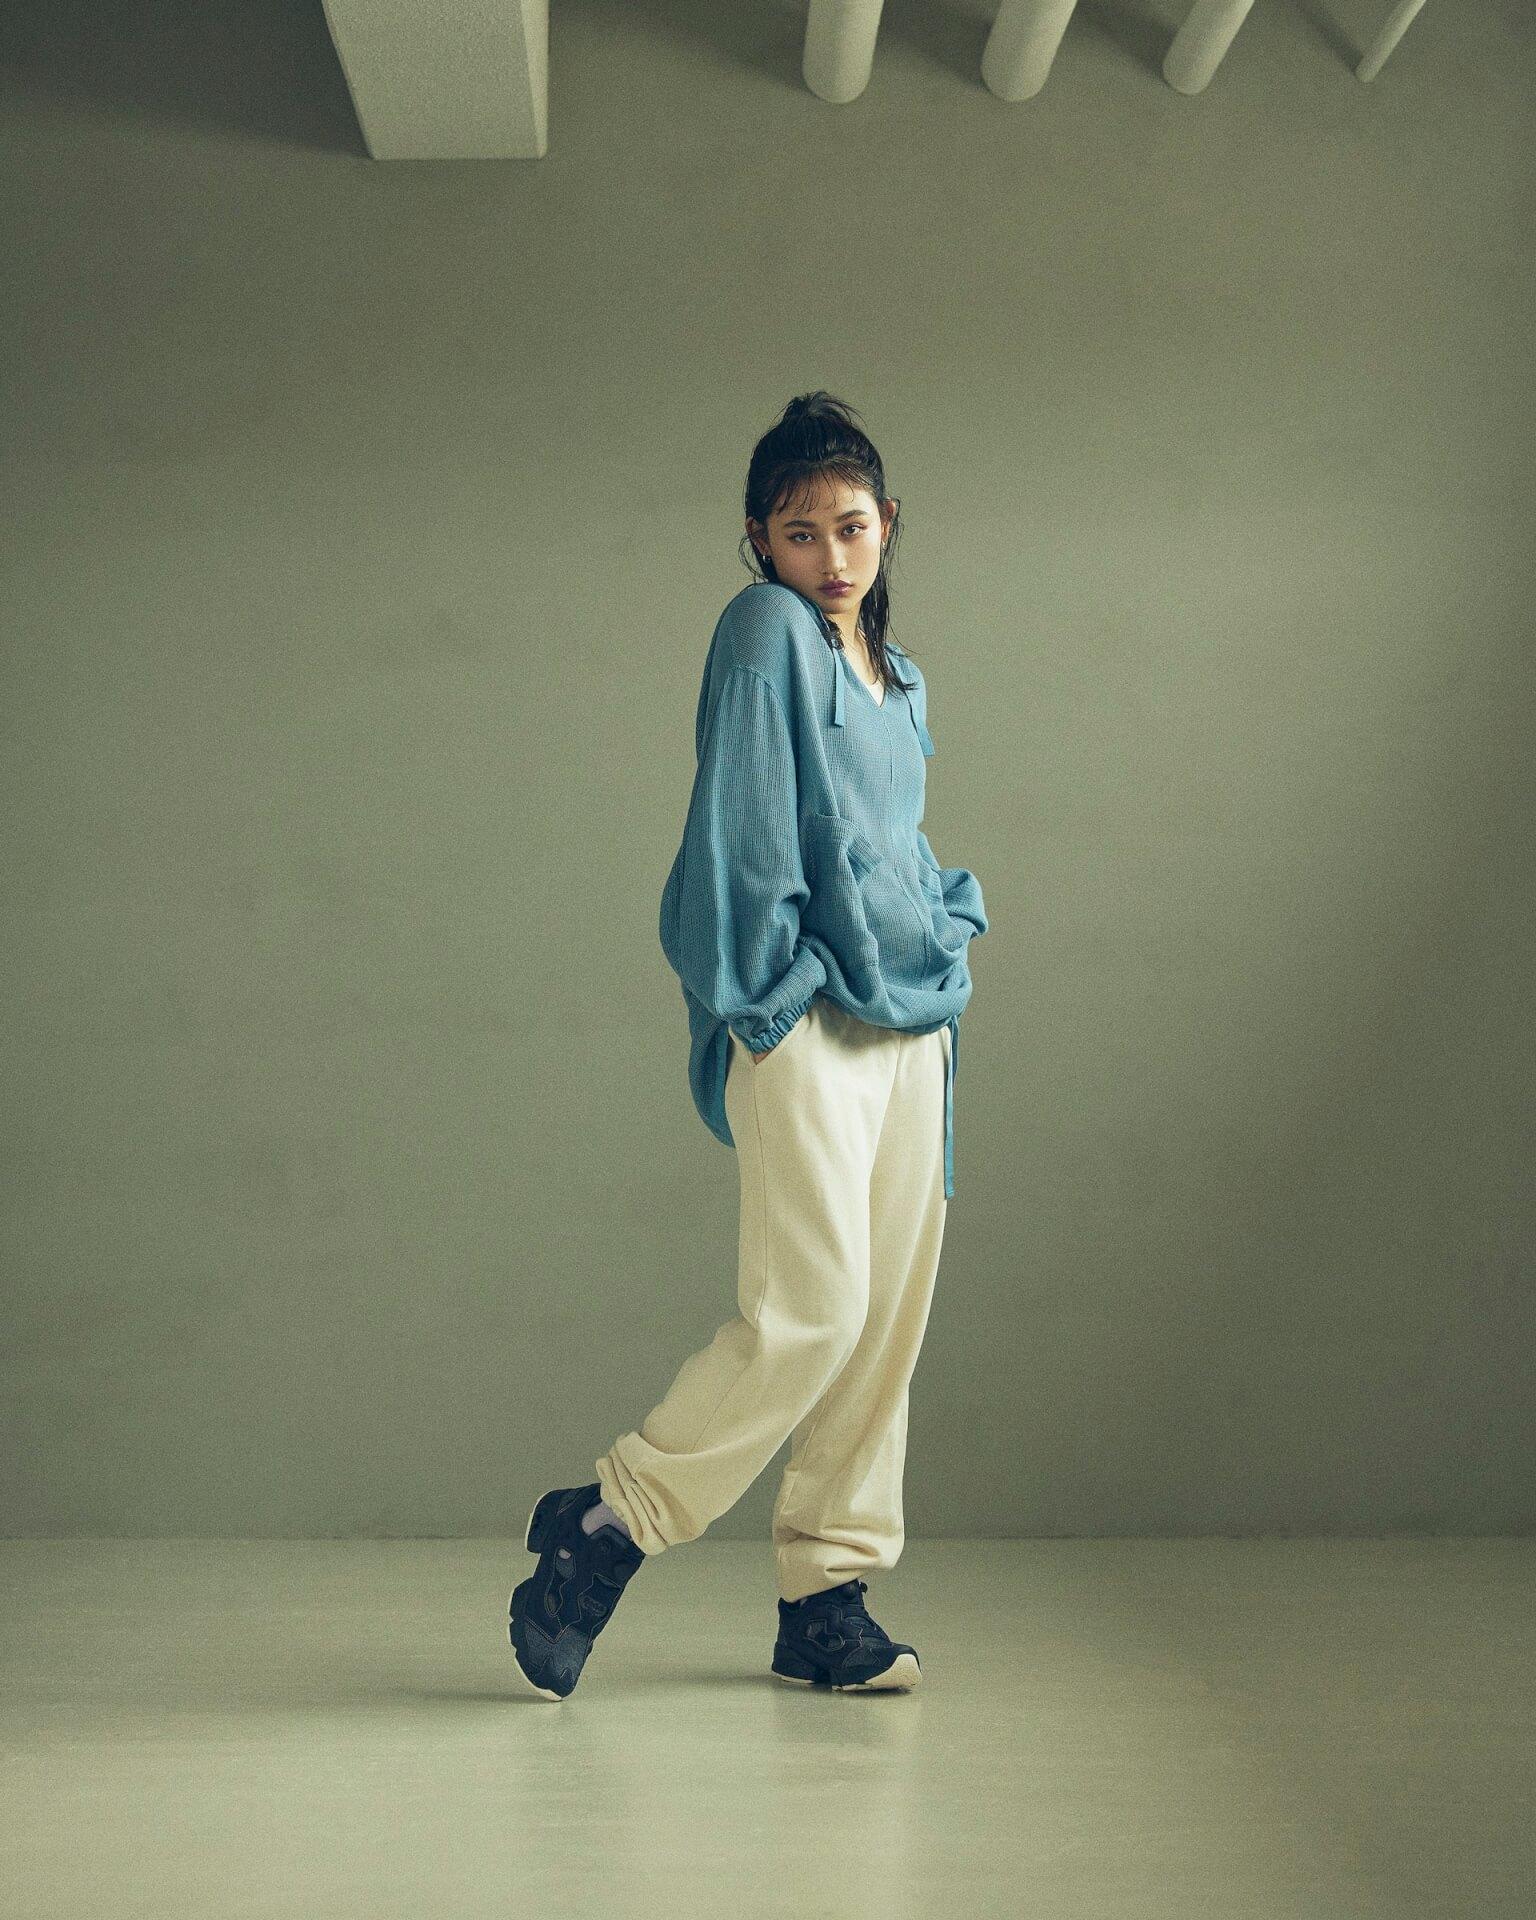 ReebokからリアルなデニムをイメージしたINSTAPUMP FURYの「DENIM PACK」が発売!櫻井海音とアンジュルム佐々木莉佳子がルックに登場 Fashion_210719_denimpack4